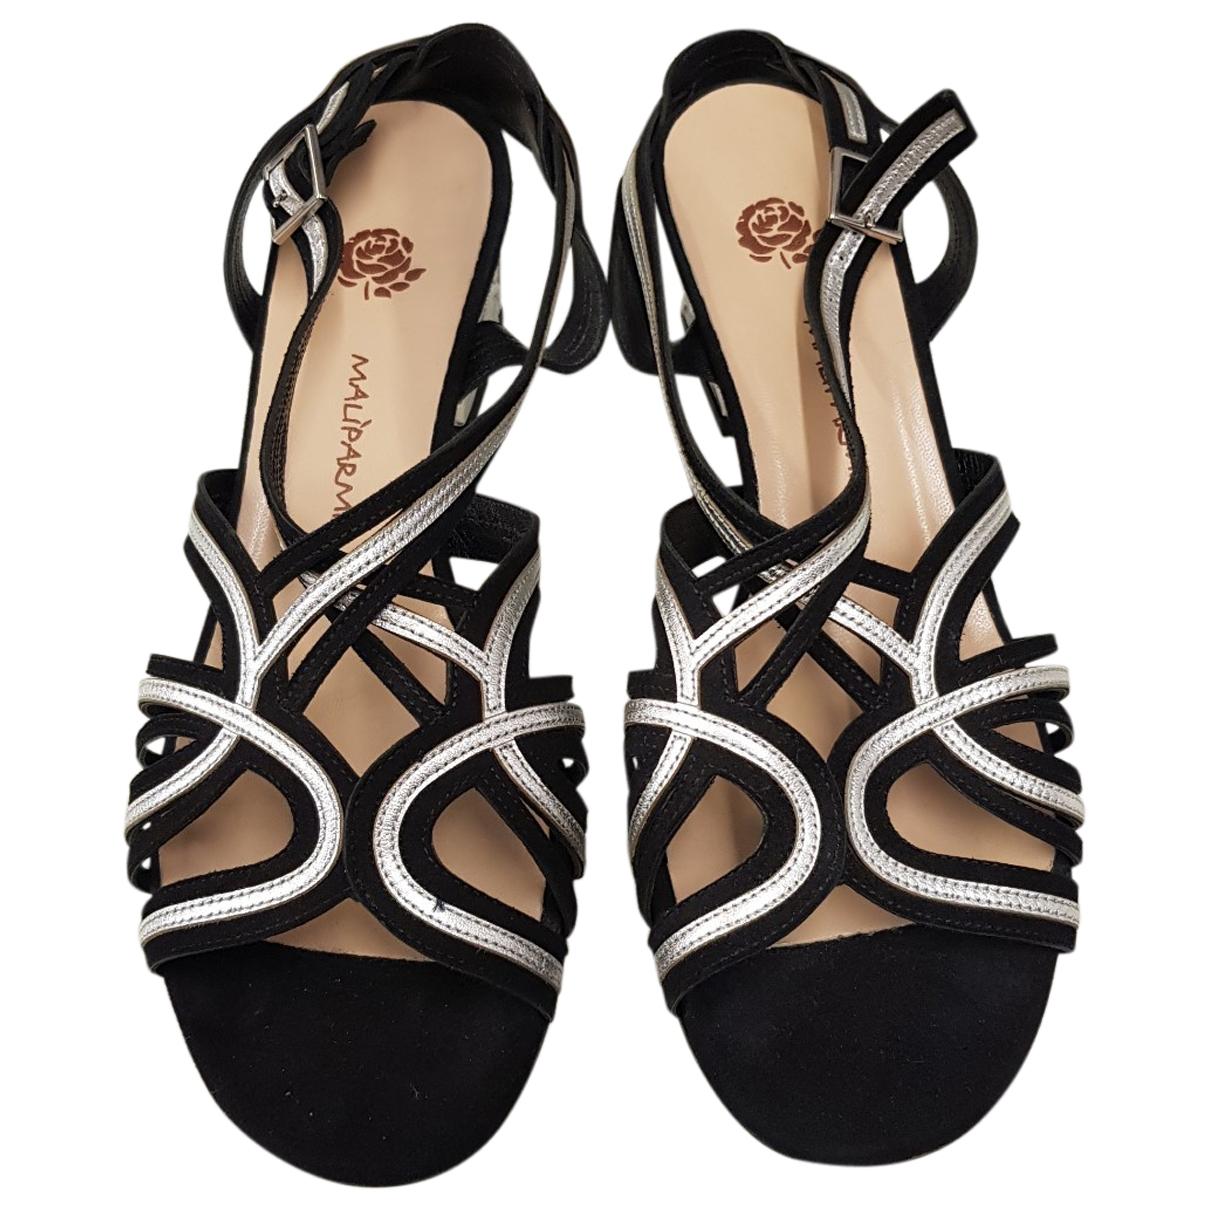 Maliparmi \N Silver Leather Sandals for Women 39 IT